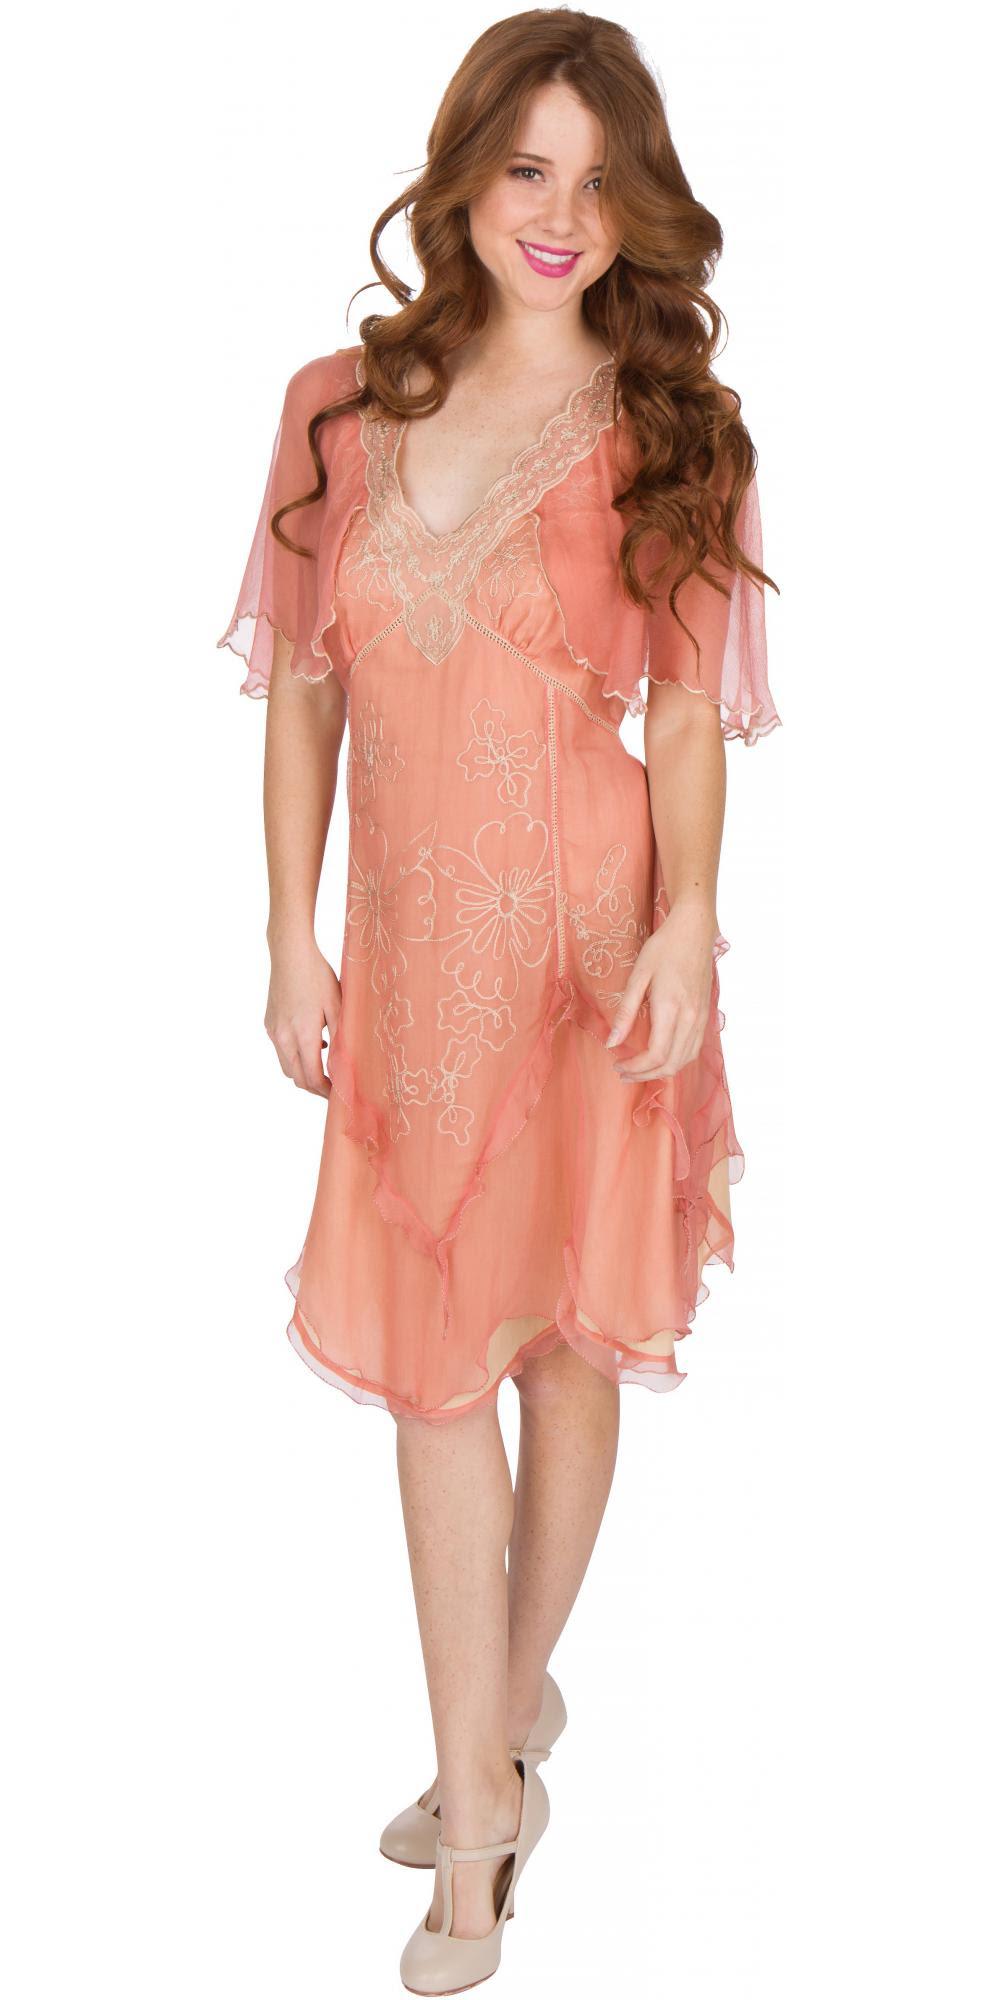 age of love nataya al241 party dress in rosegold